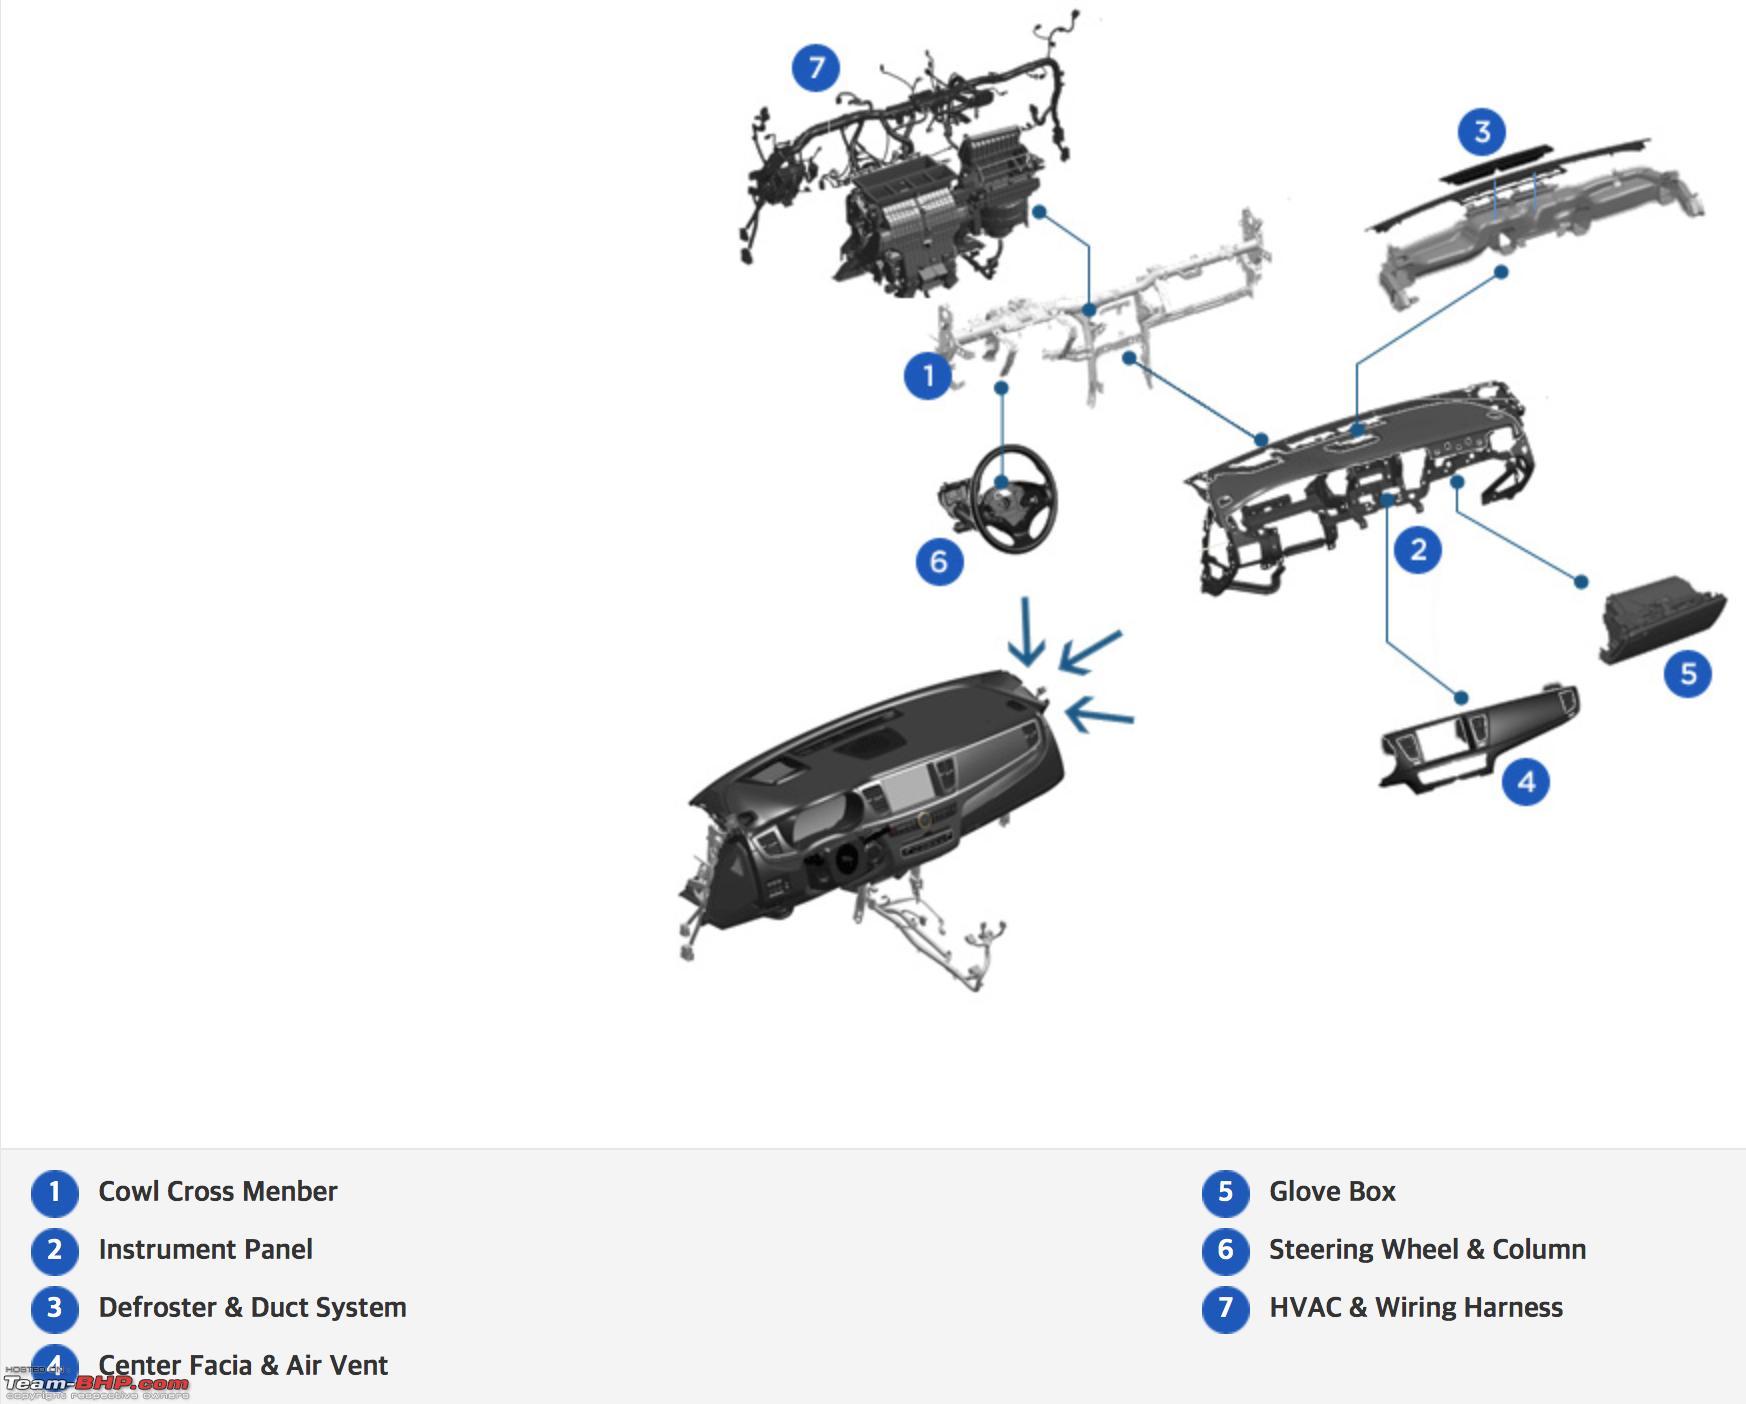 hight resolution of hyundai i10 wiring diagram hyundai auto wiring diagram